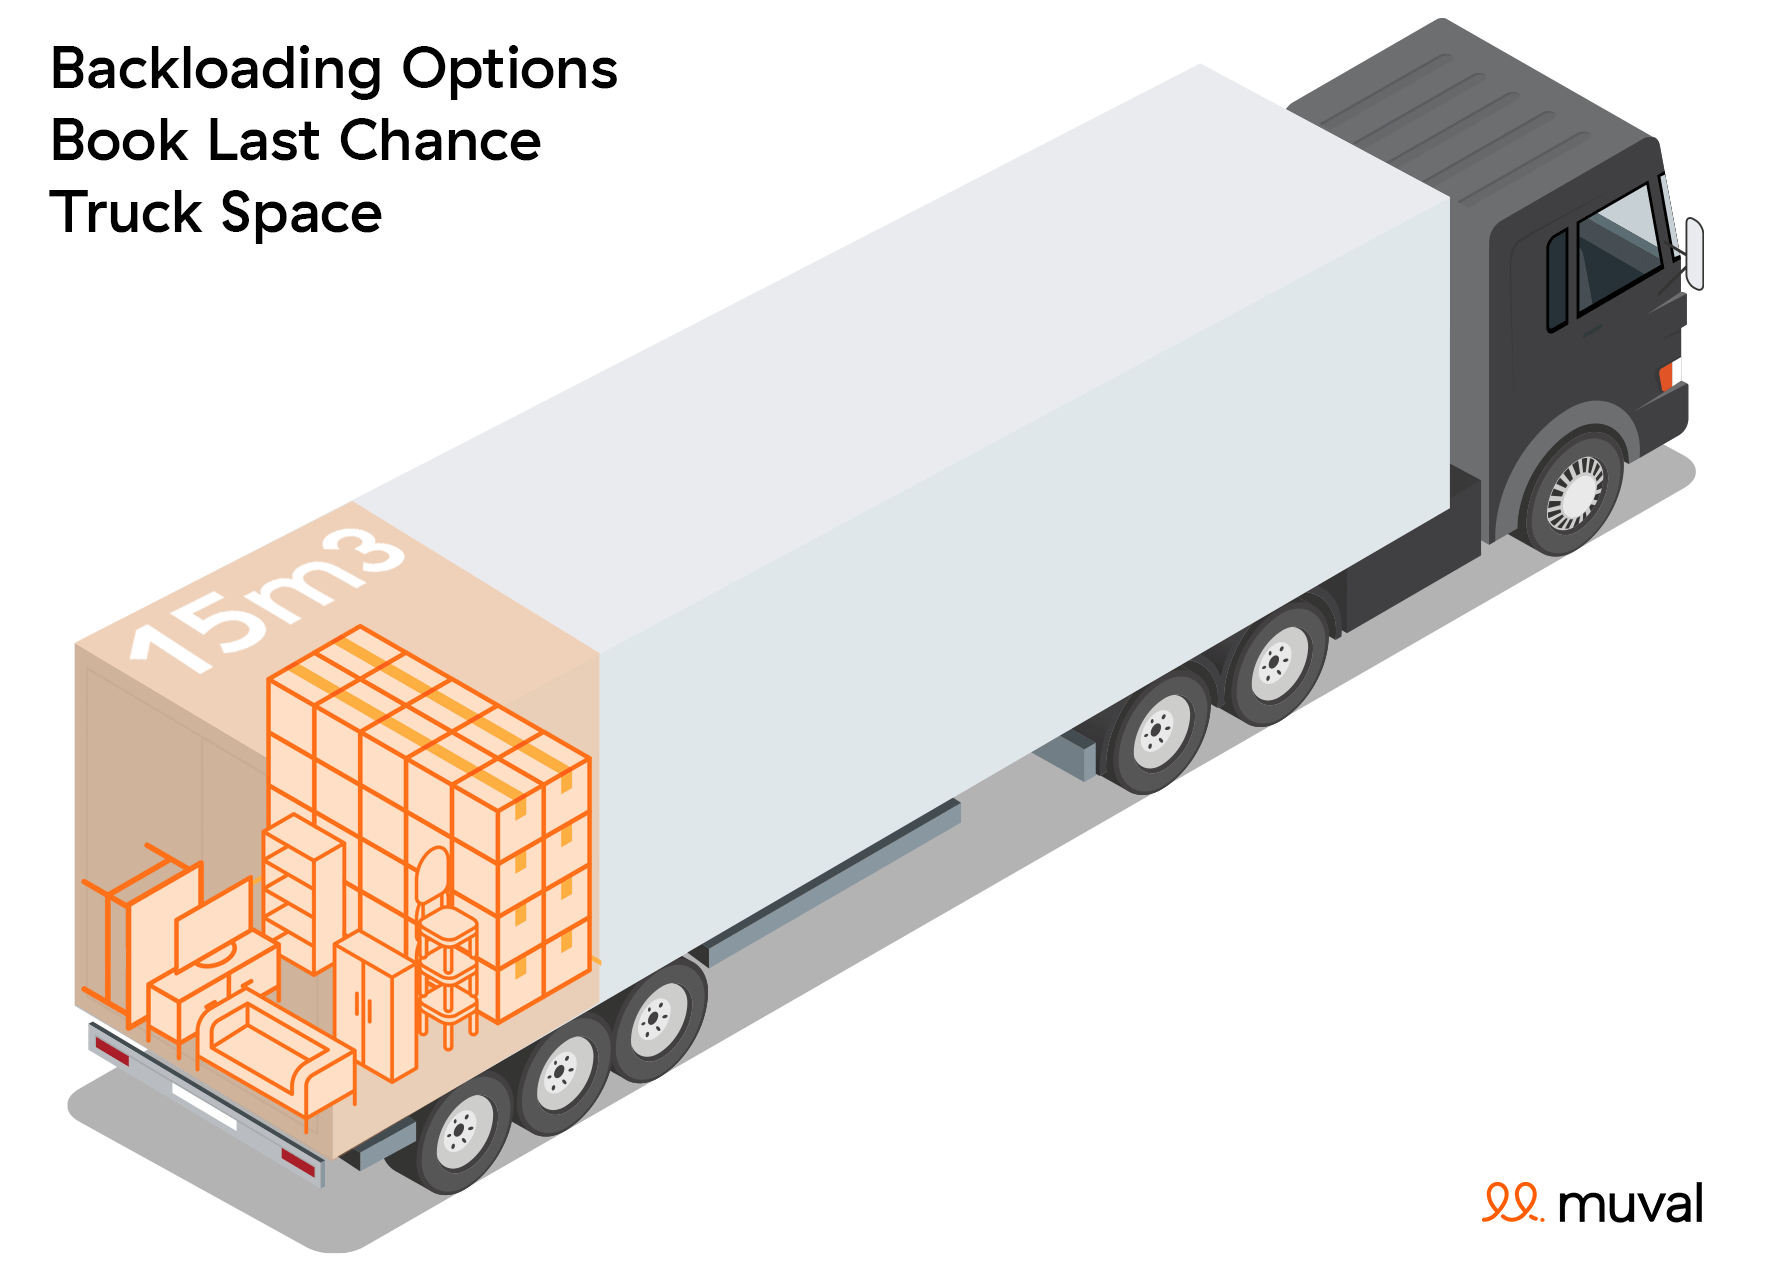 removalist trucksize backloading